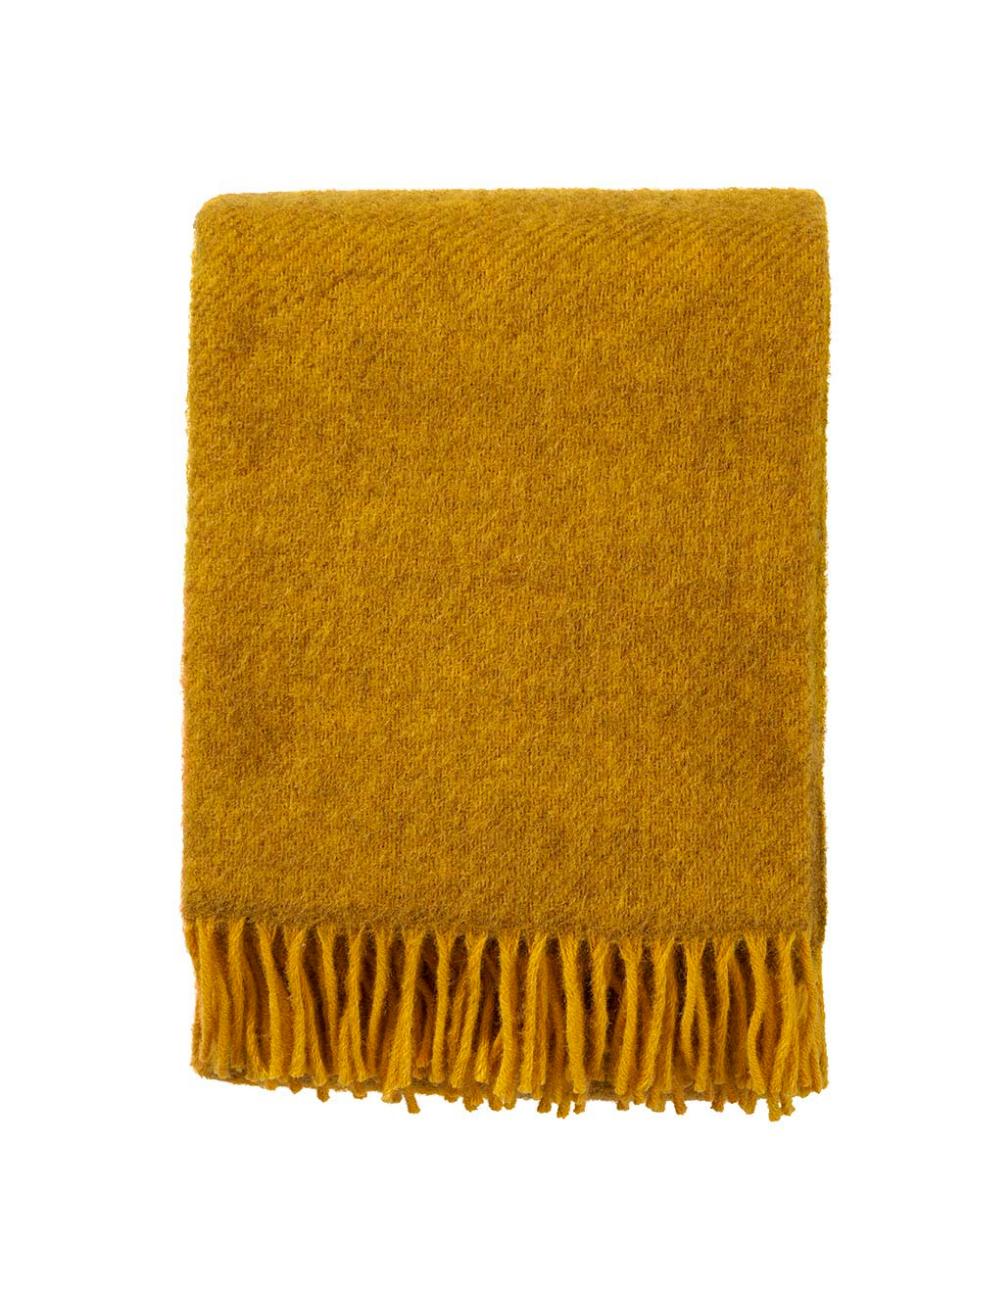 Gotland Yellow Wool Blanket